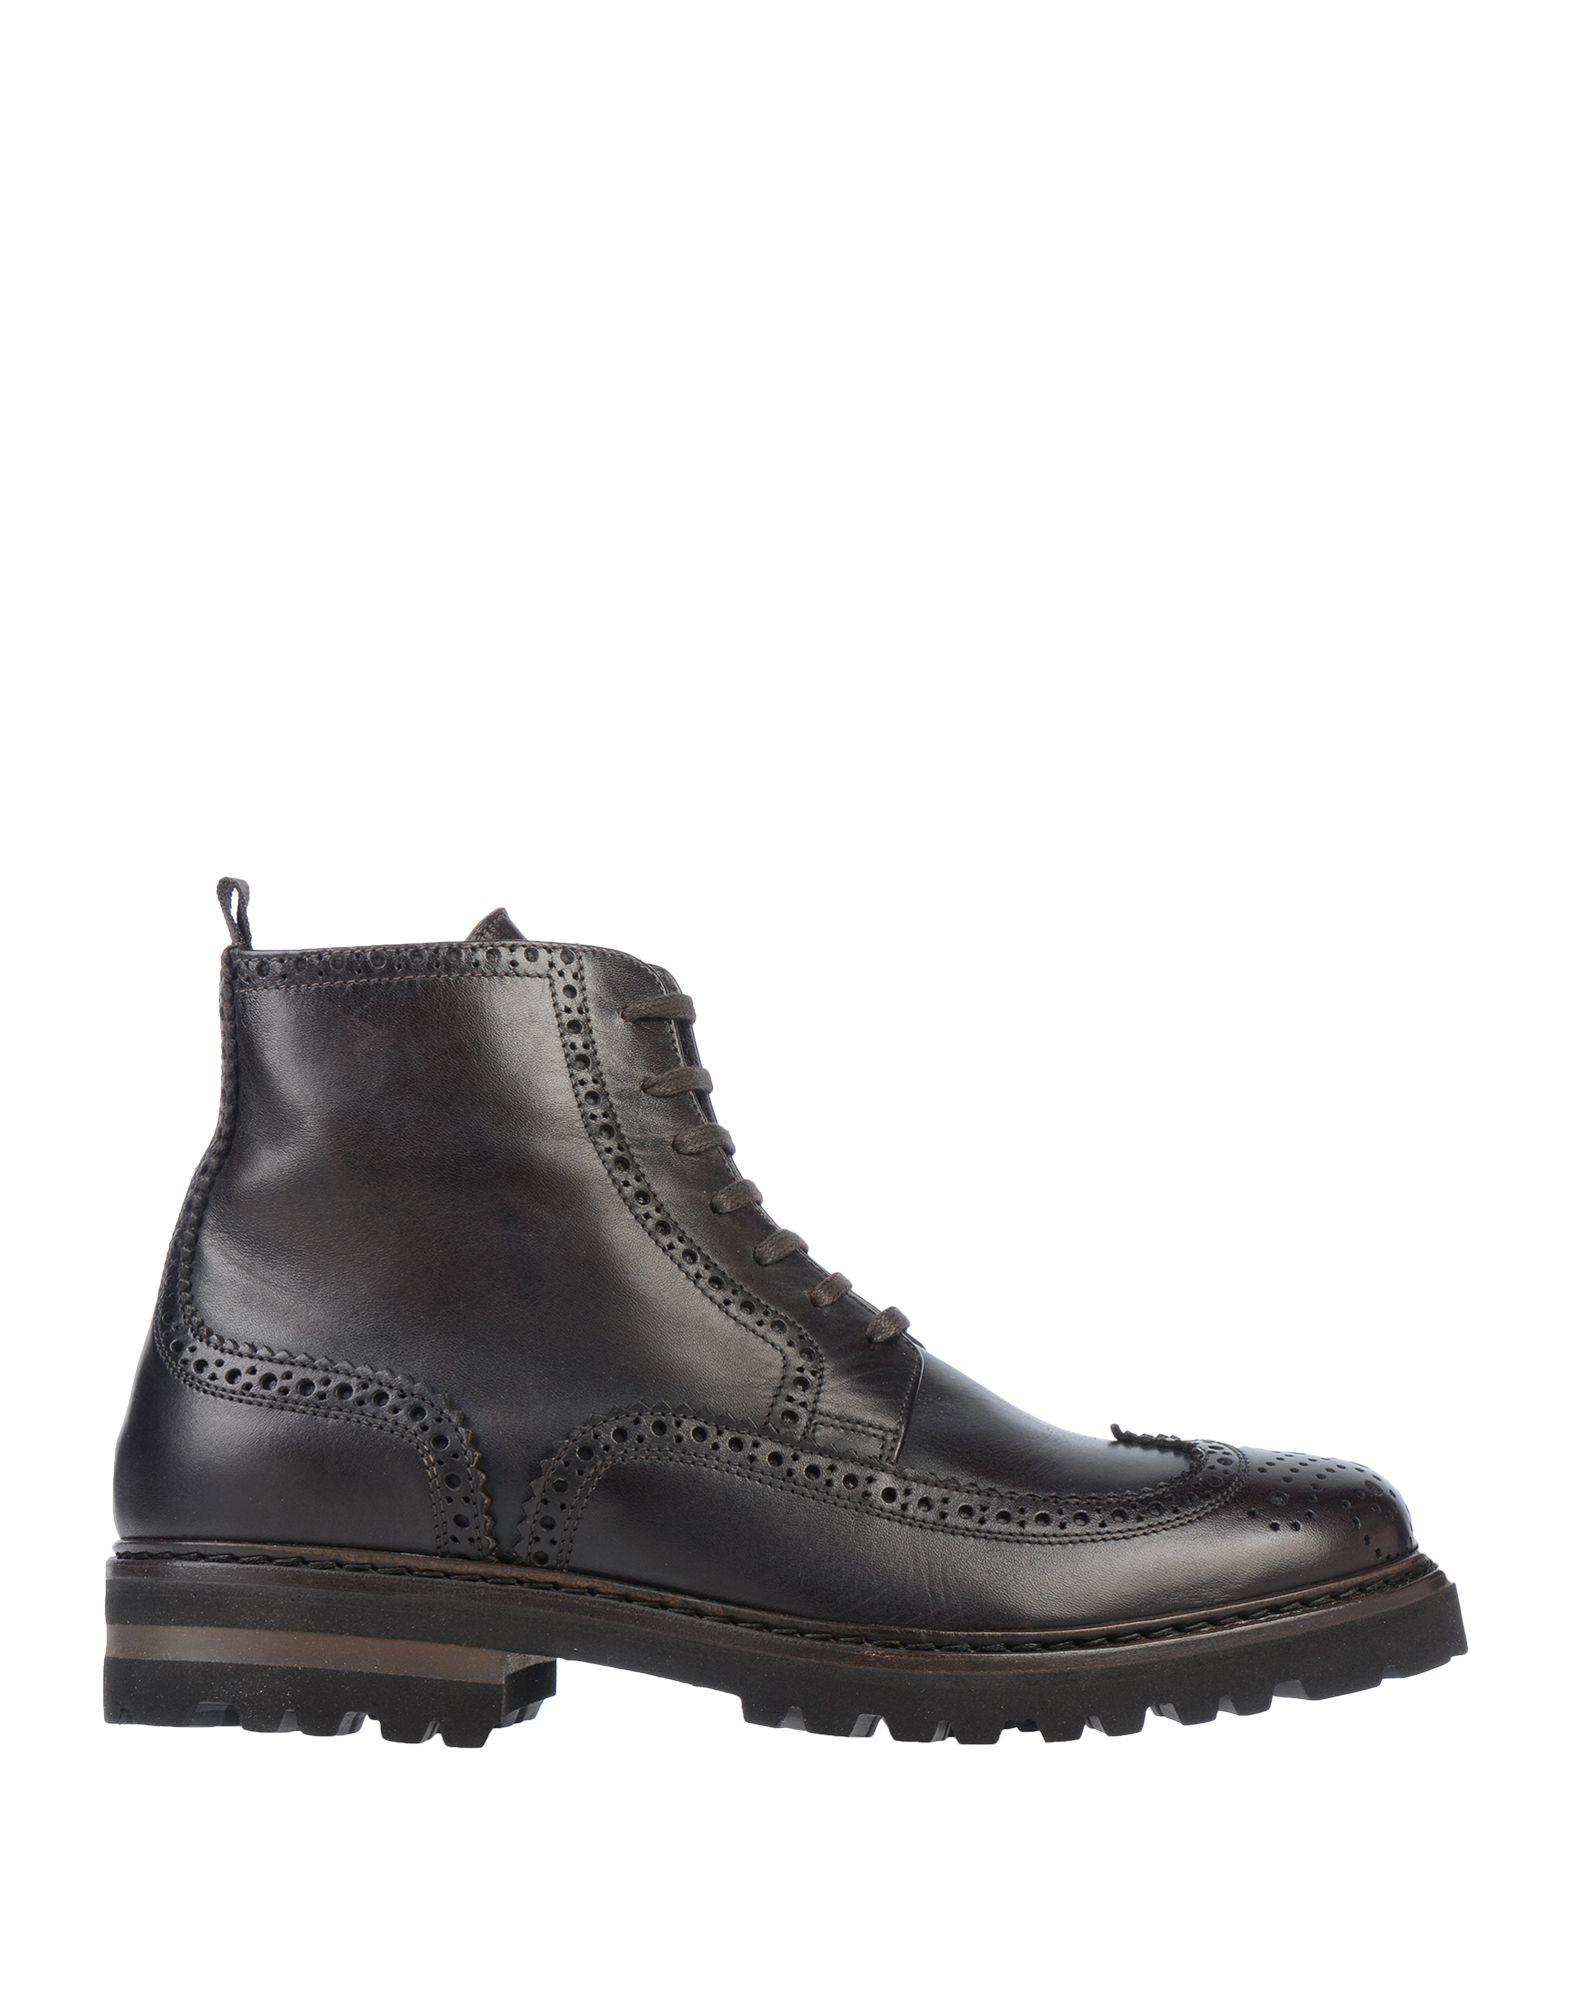 FLEXA by FRATELLI ROSSETTI Полусапоги и высокие ботинки mares vest flexa 5 3mm man